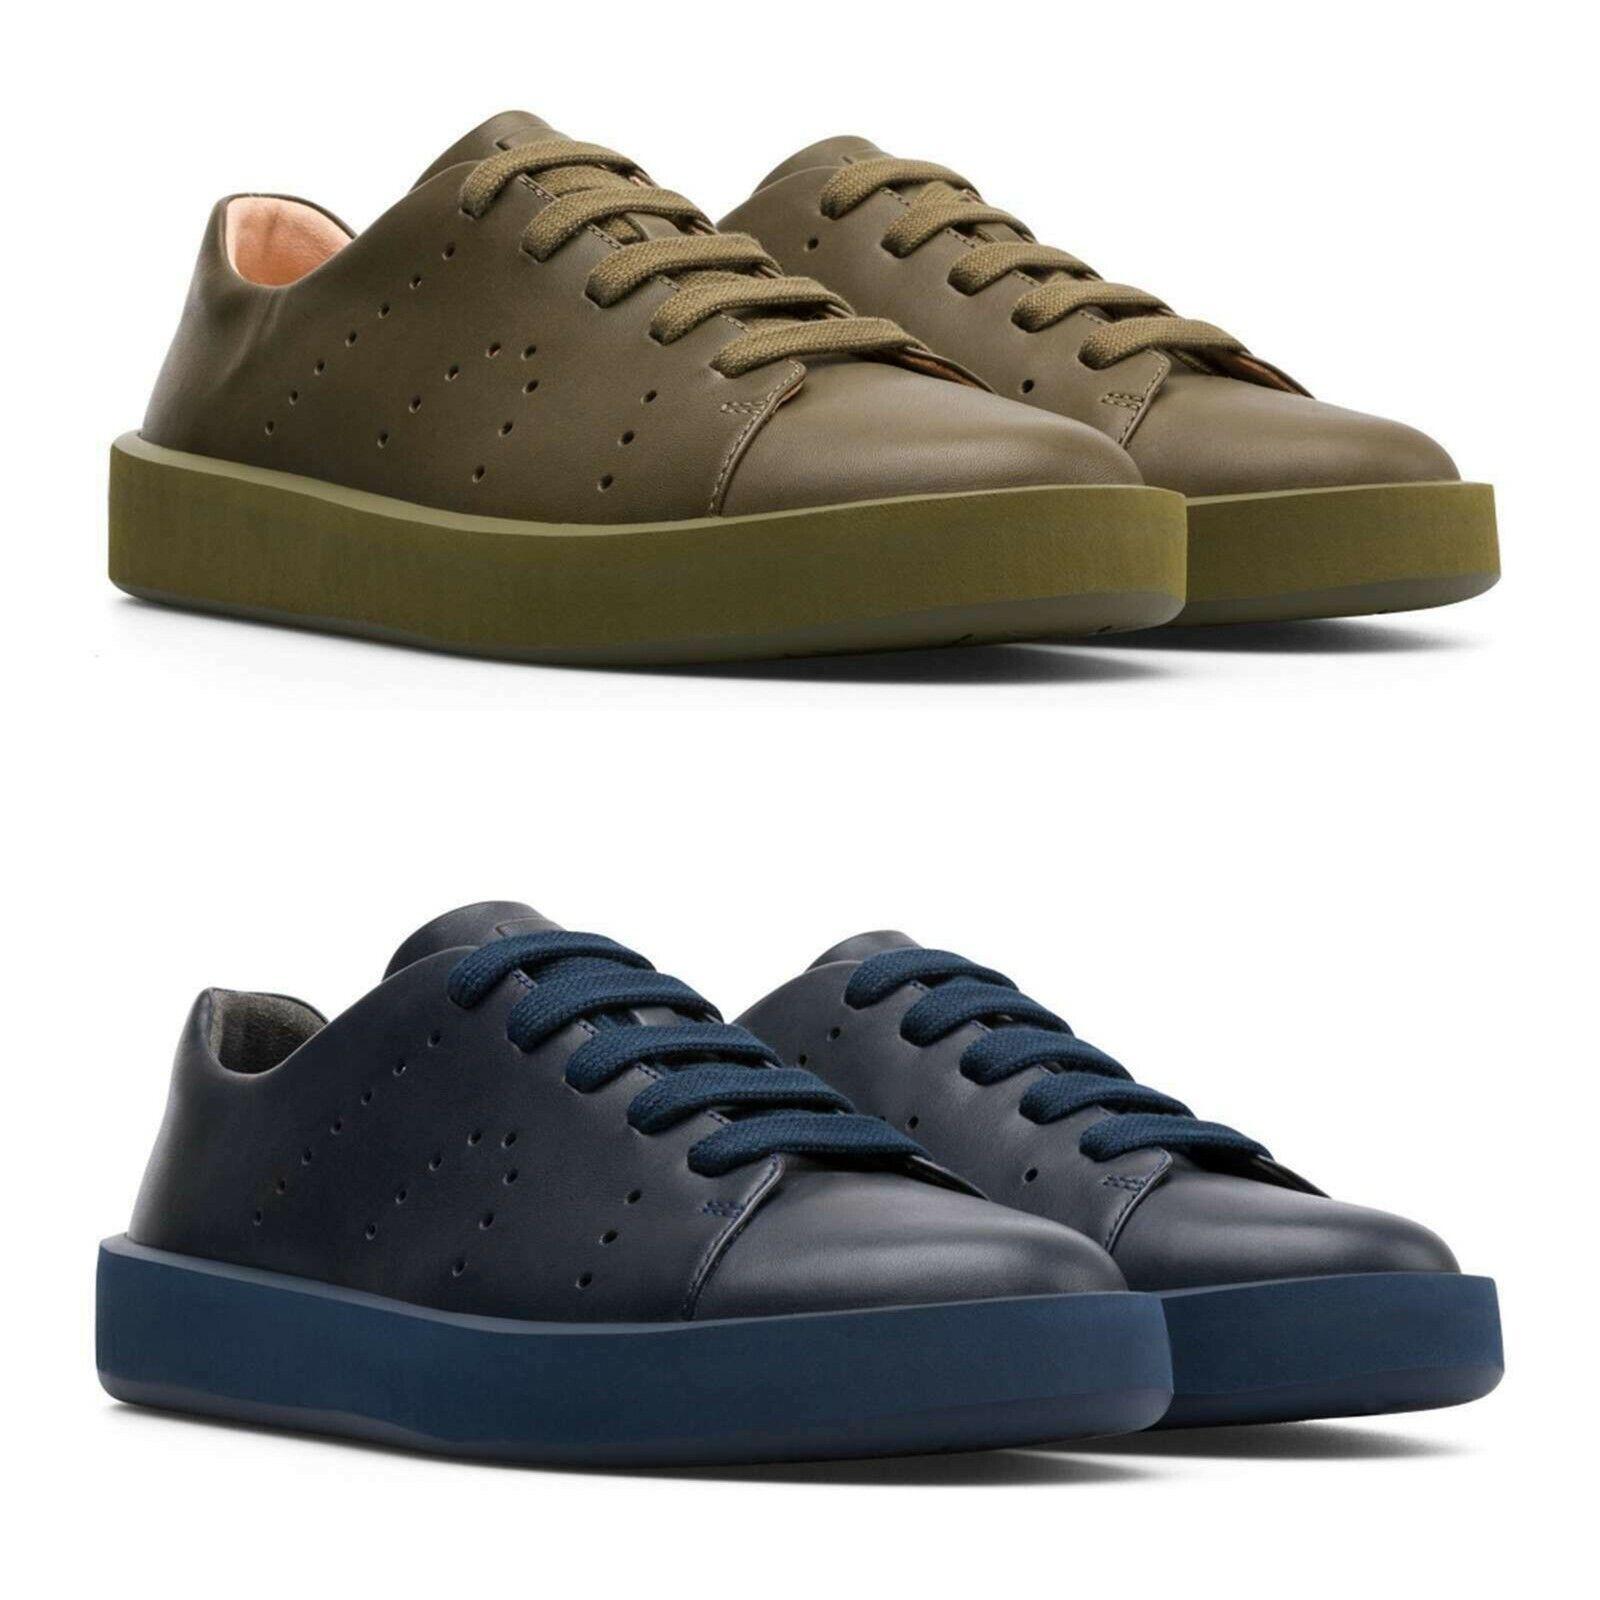 NEW Camper Men's Classic Casual Courb Leather scarpe da ginnastica OrthoLite Comfort scarpe